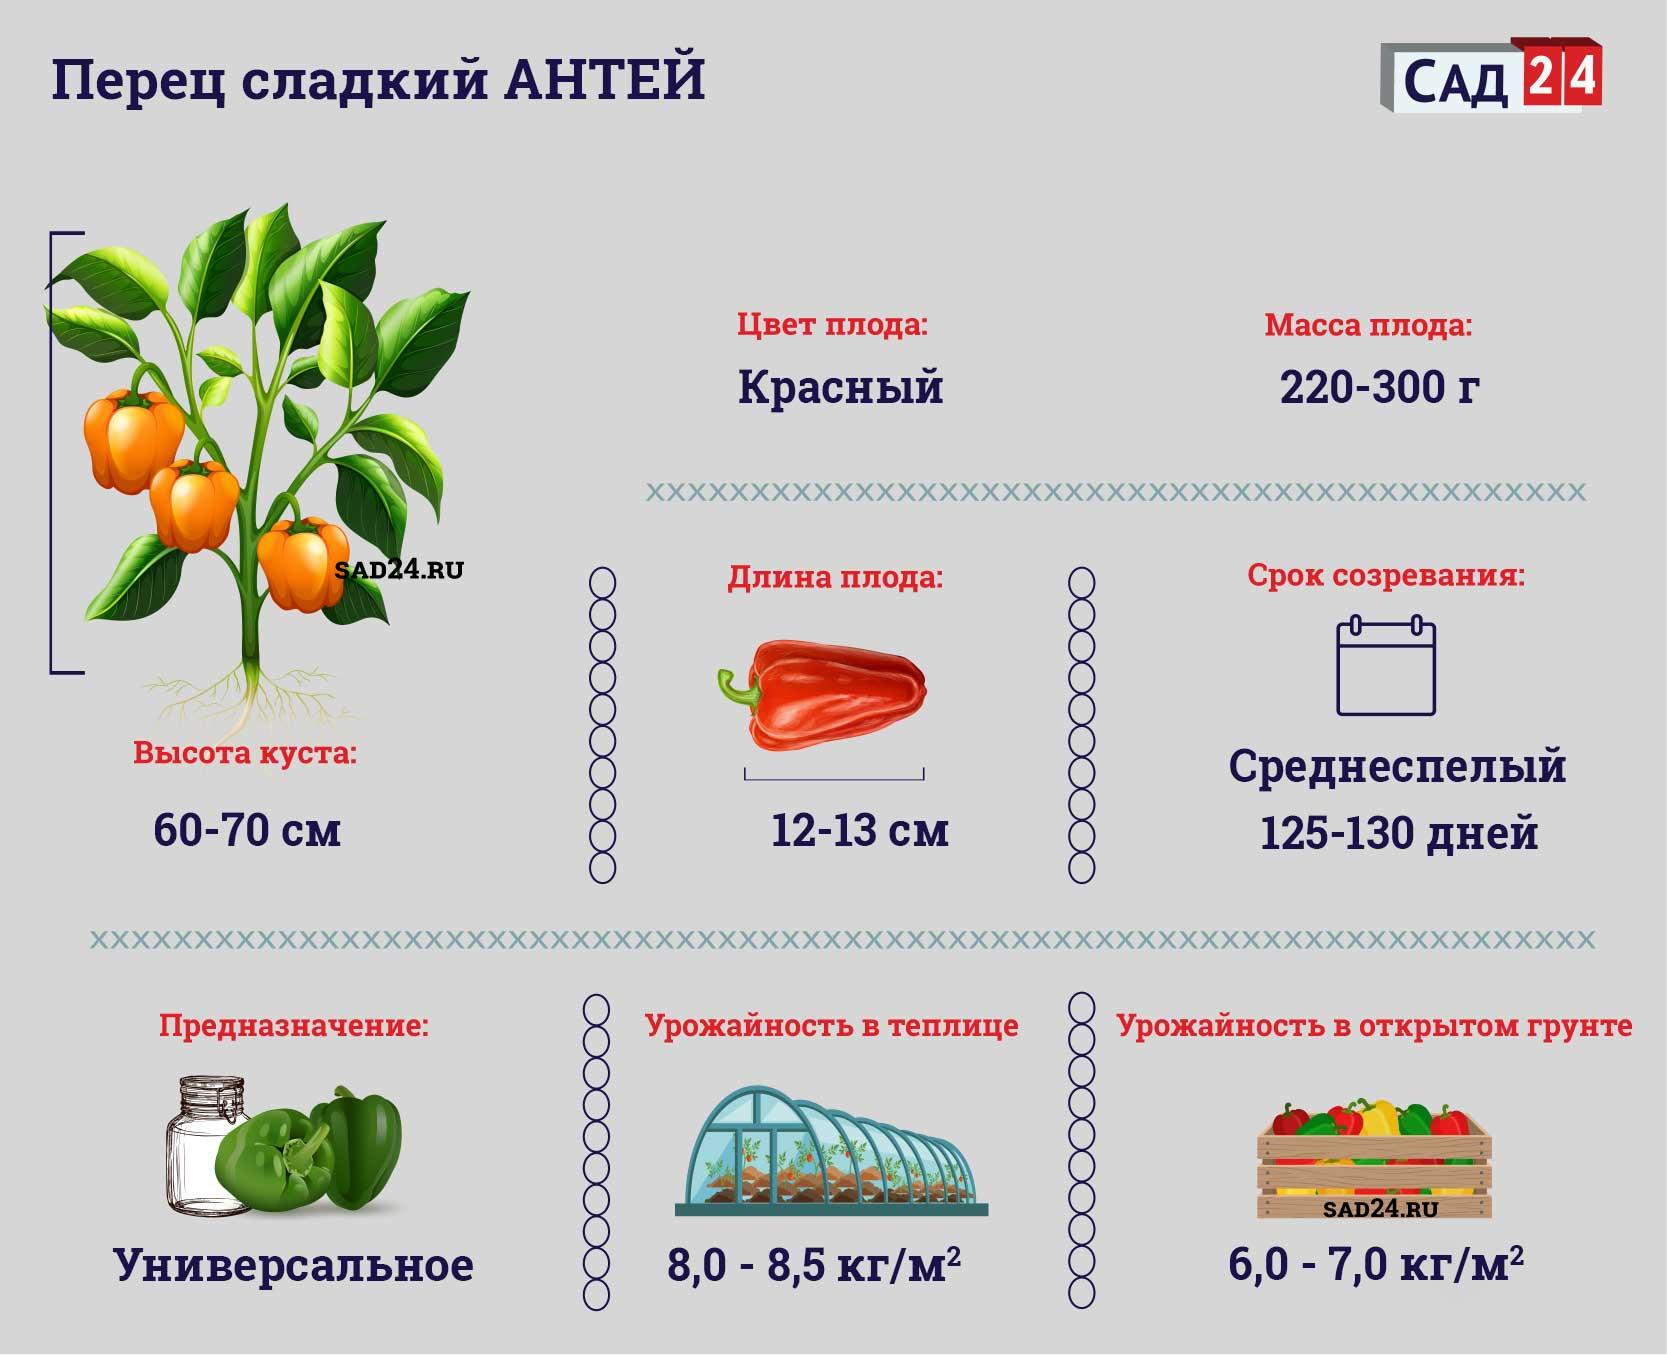 Антей - https://sad24.ru